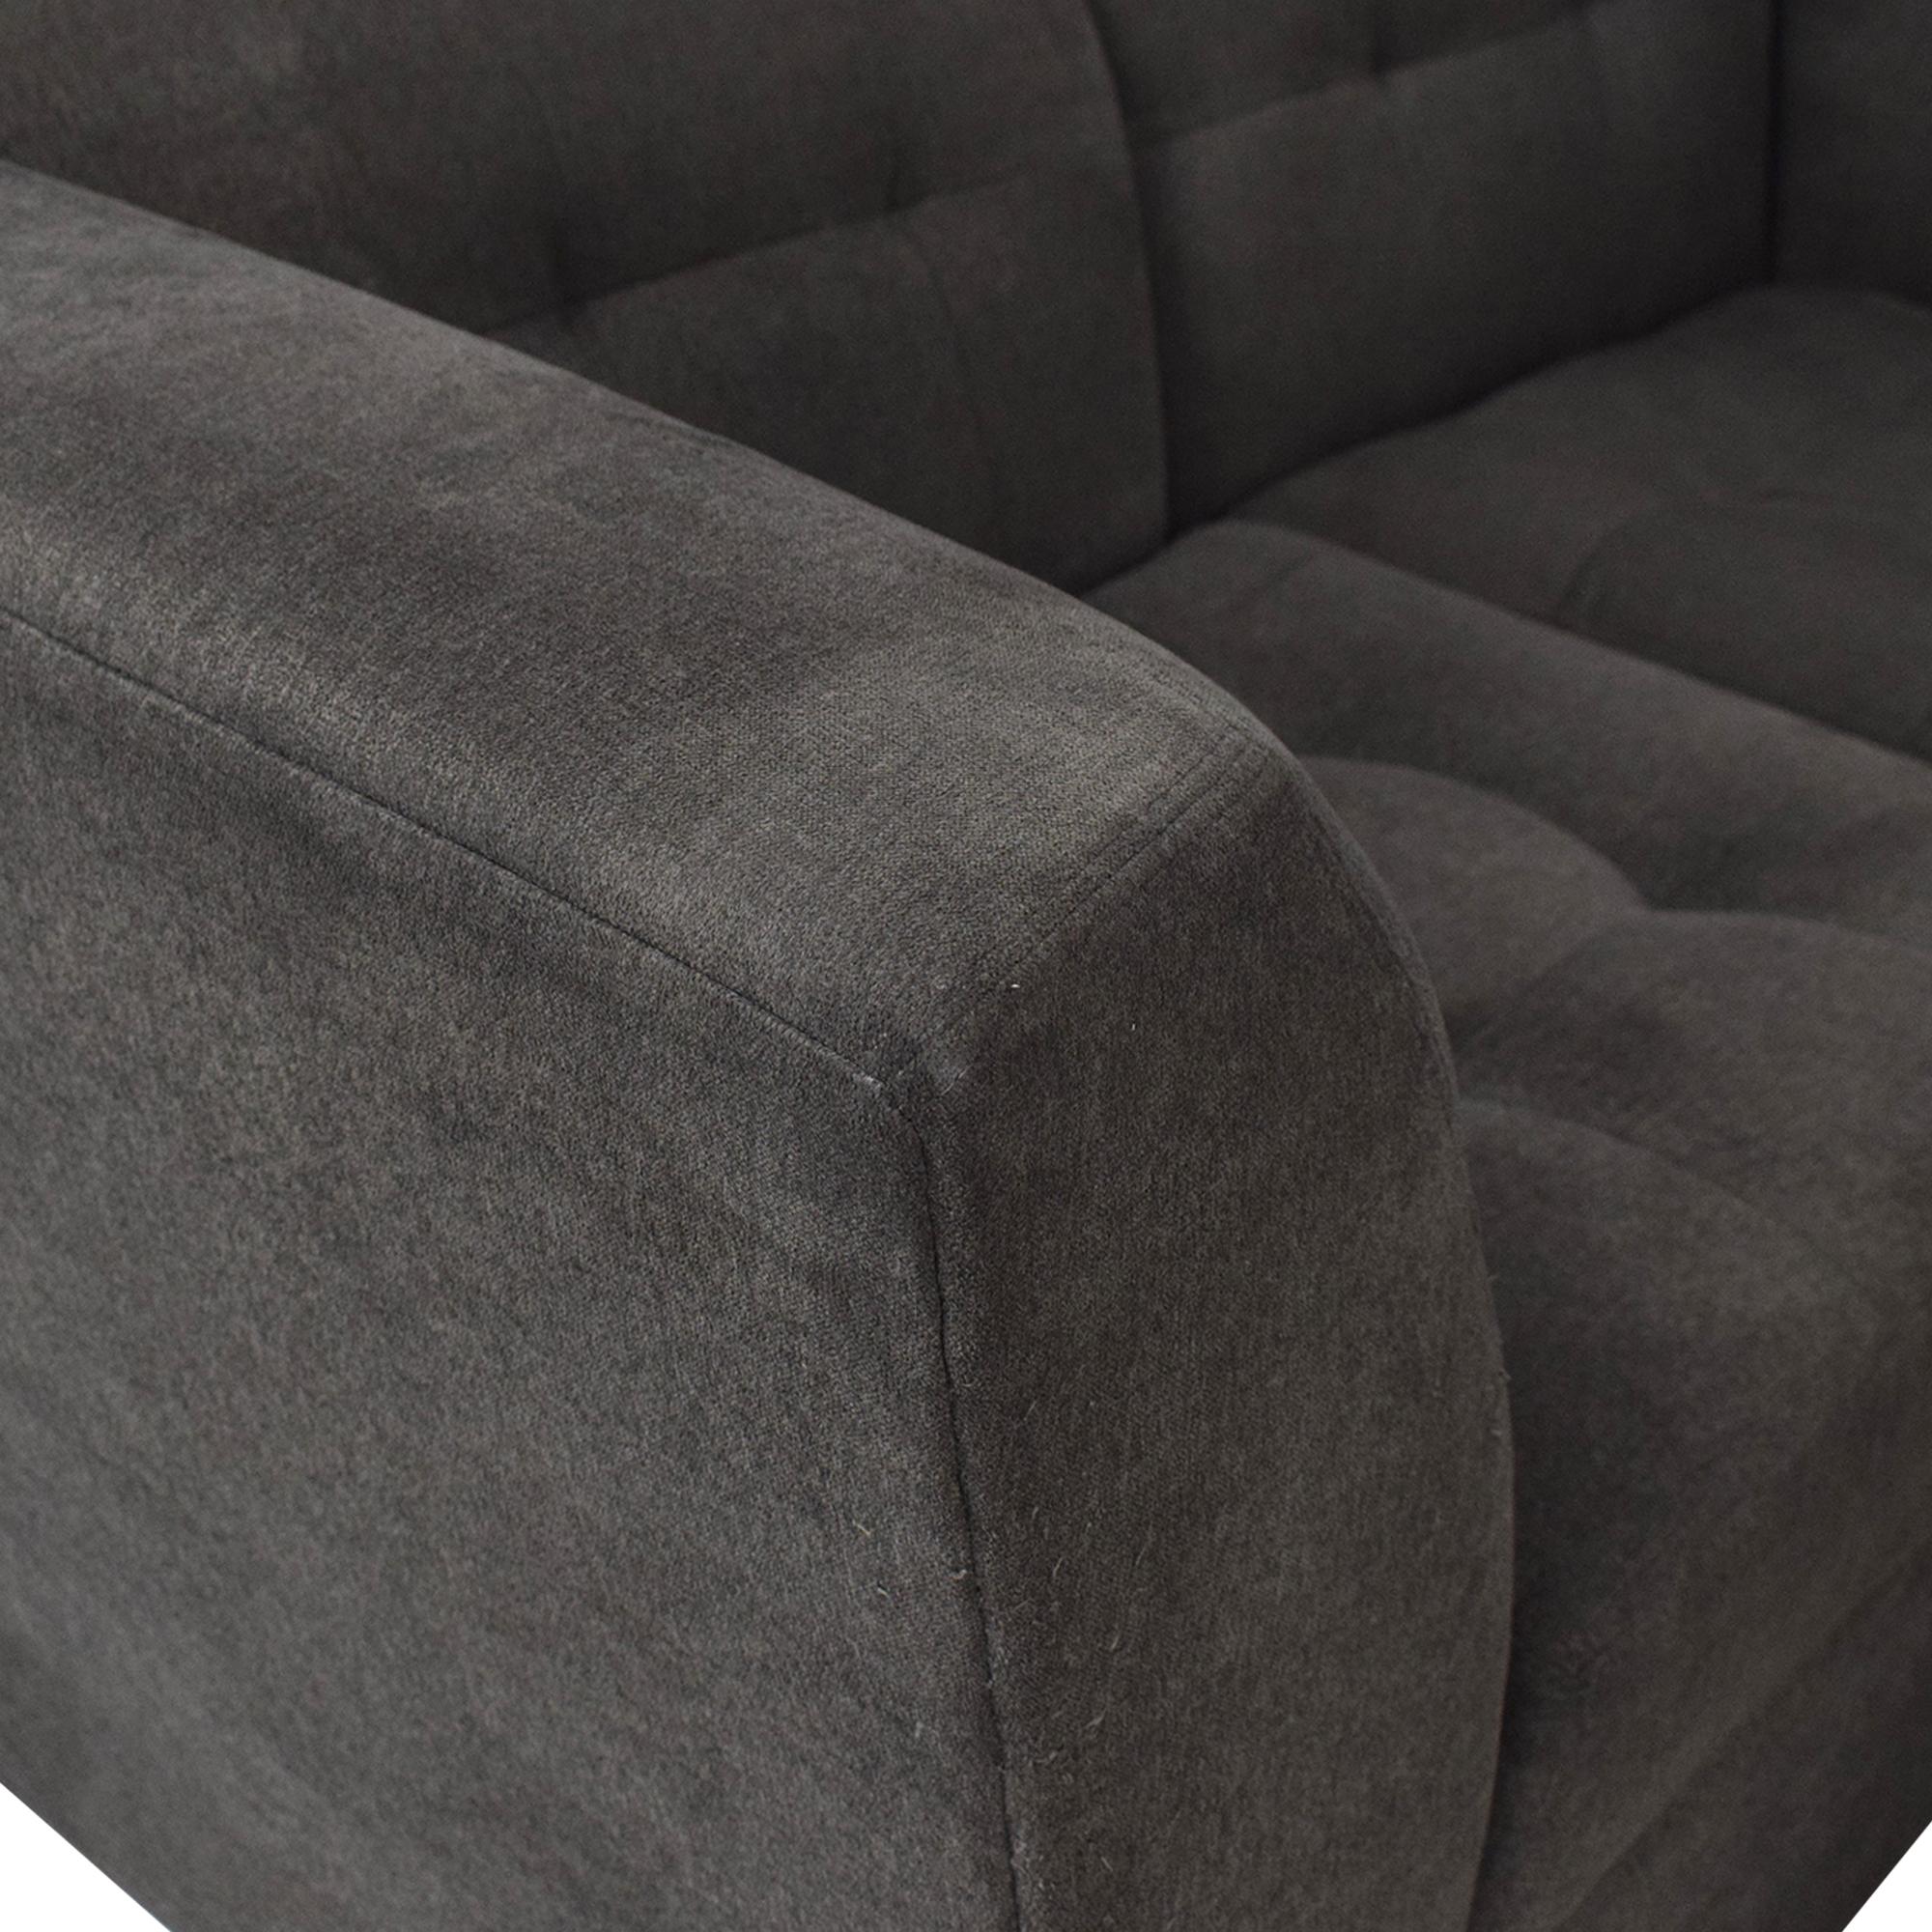 buy Macy's Roxanne II Modular Sofa with Bumper Chaise Macy's